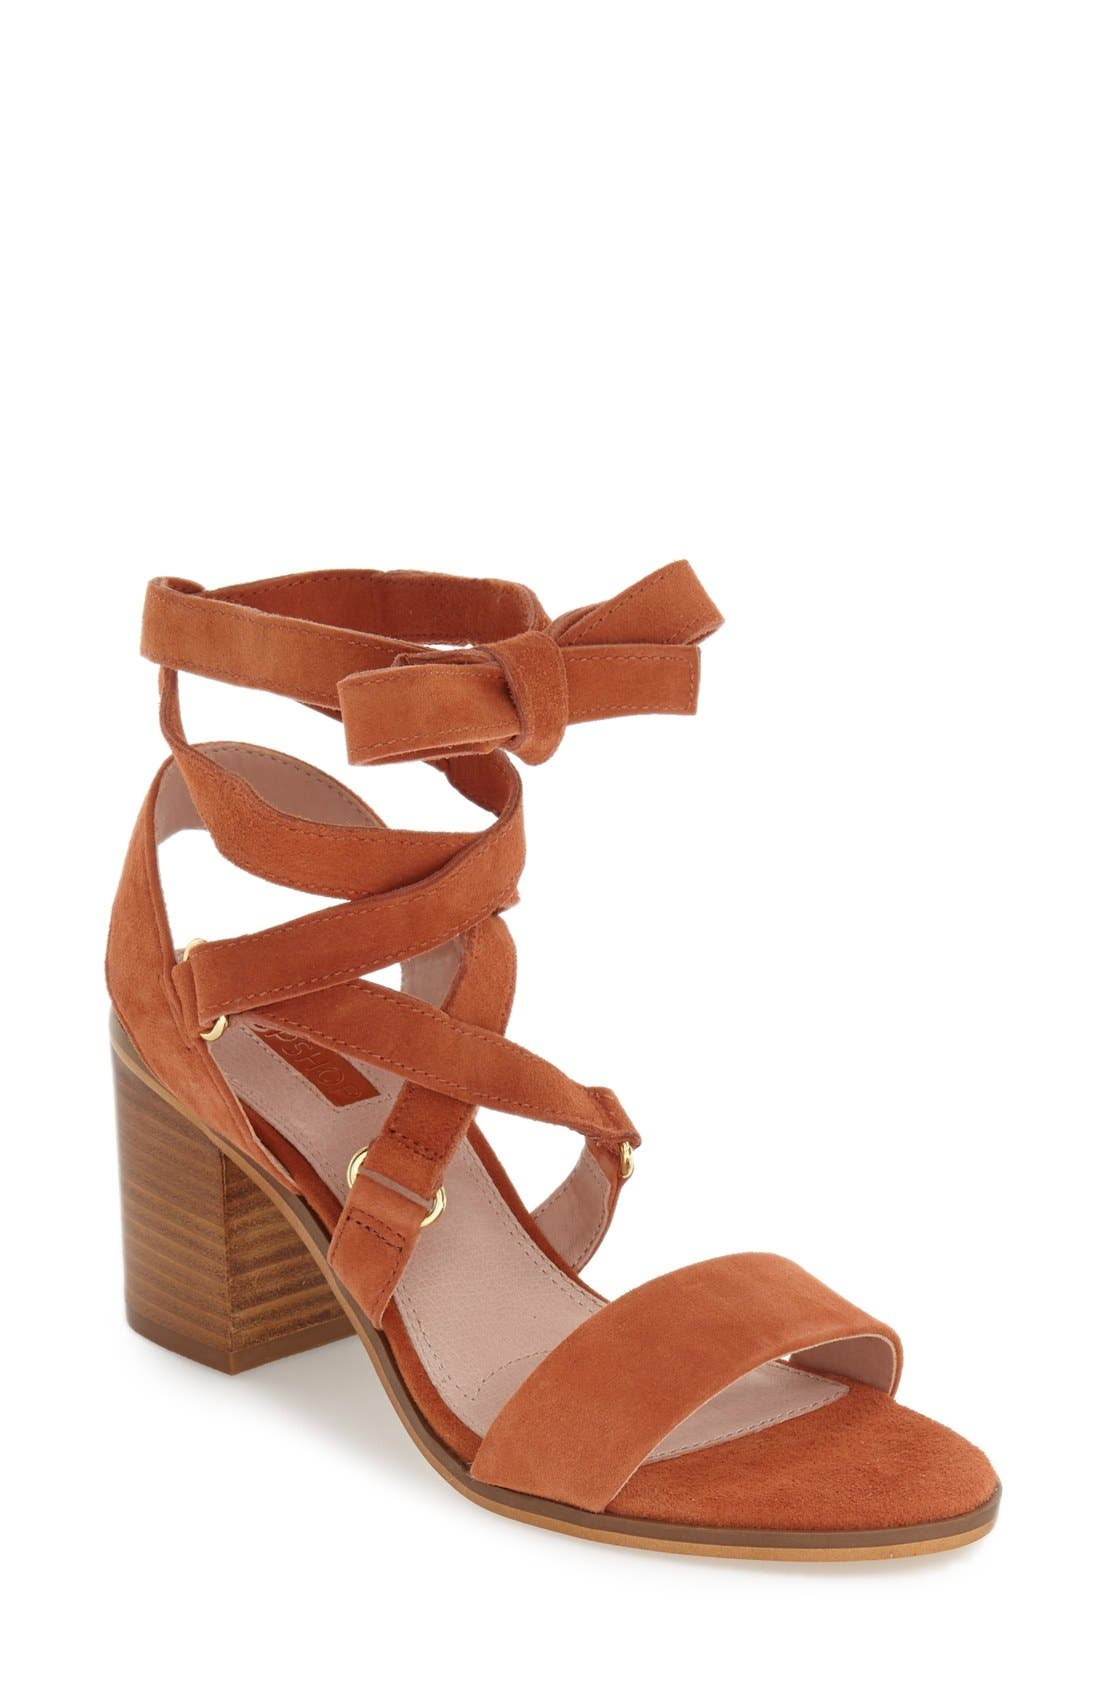 'Nadra' Lace-Up Sandal,                         Main,                         color, Orange Suede